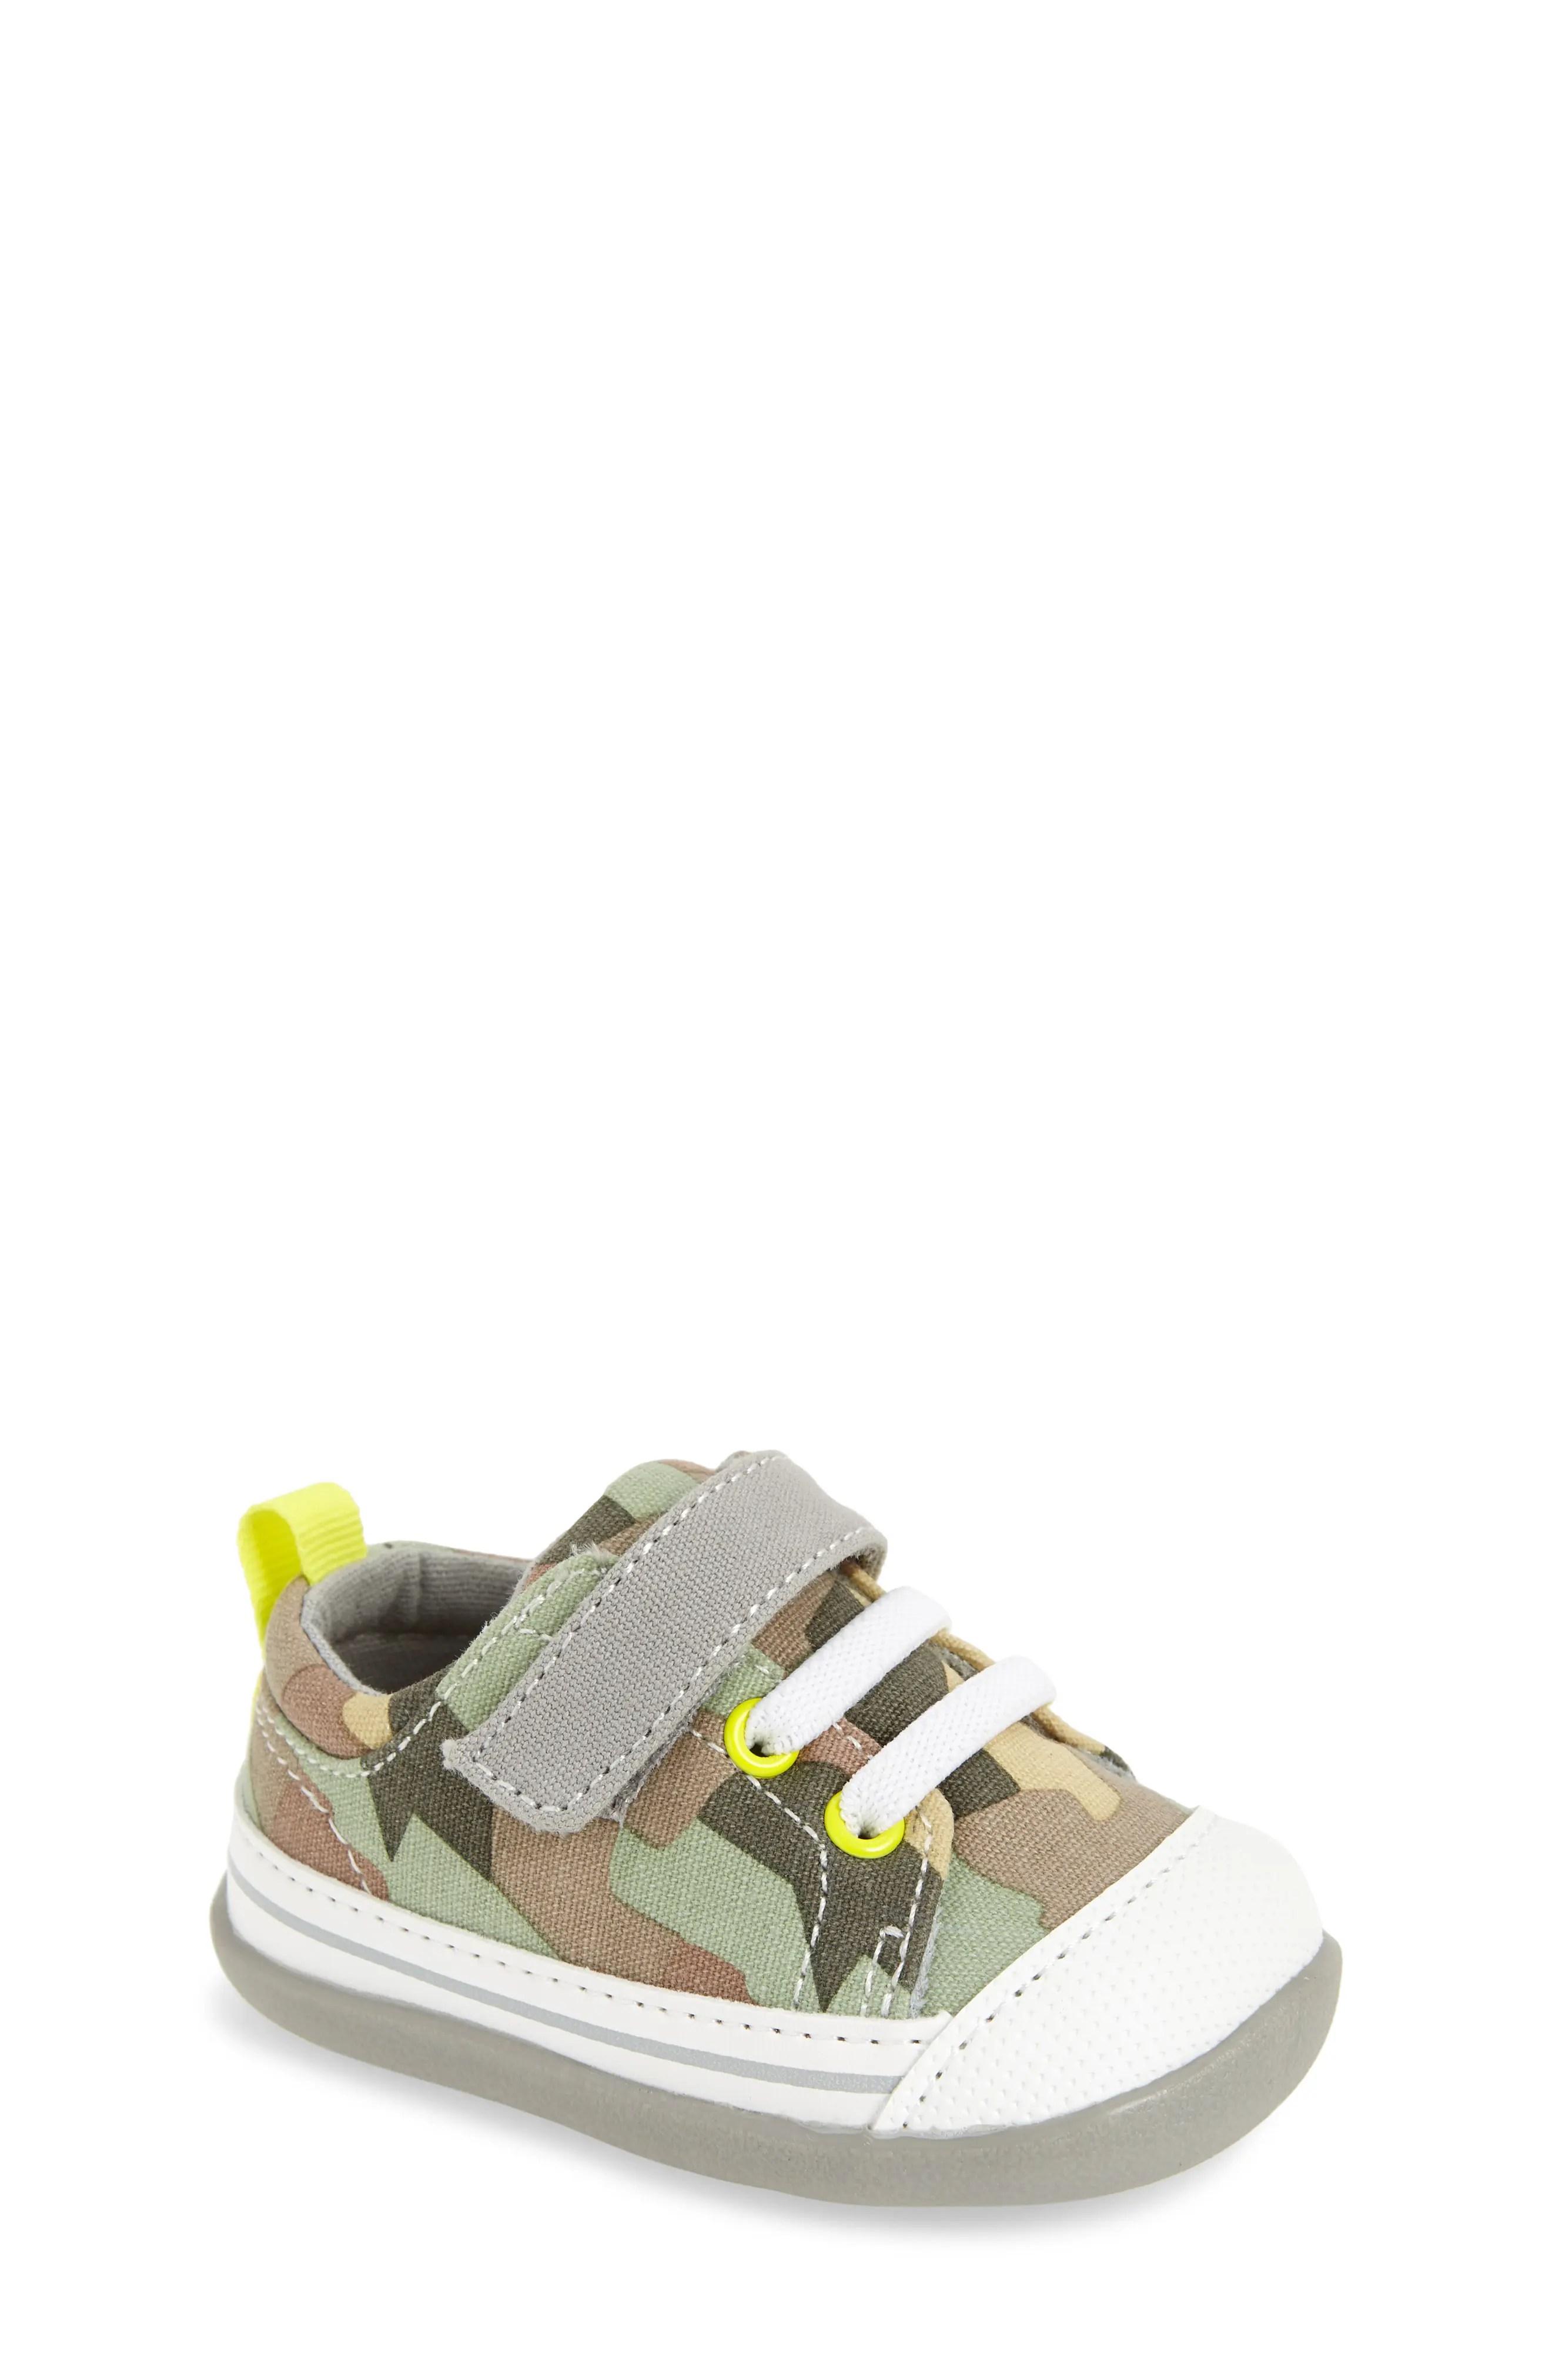 nordstrom rack baby girl shoes online